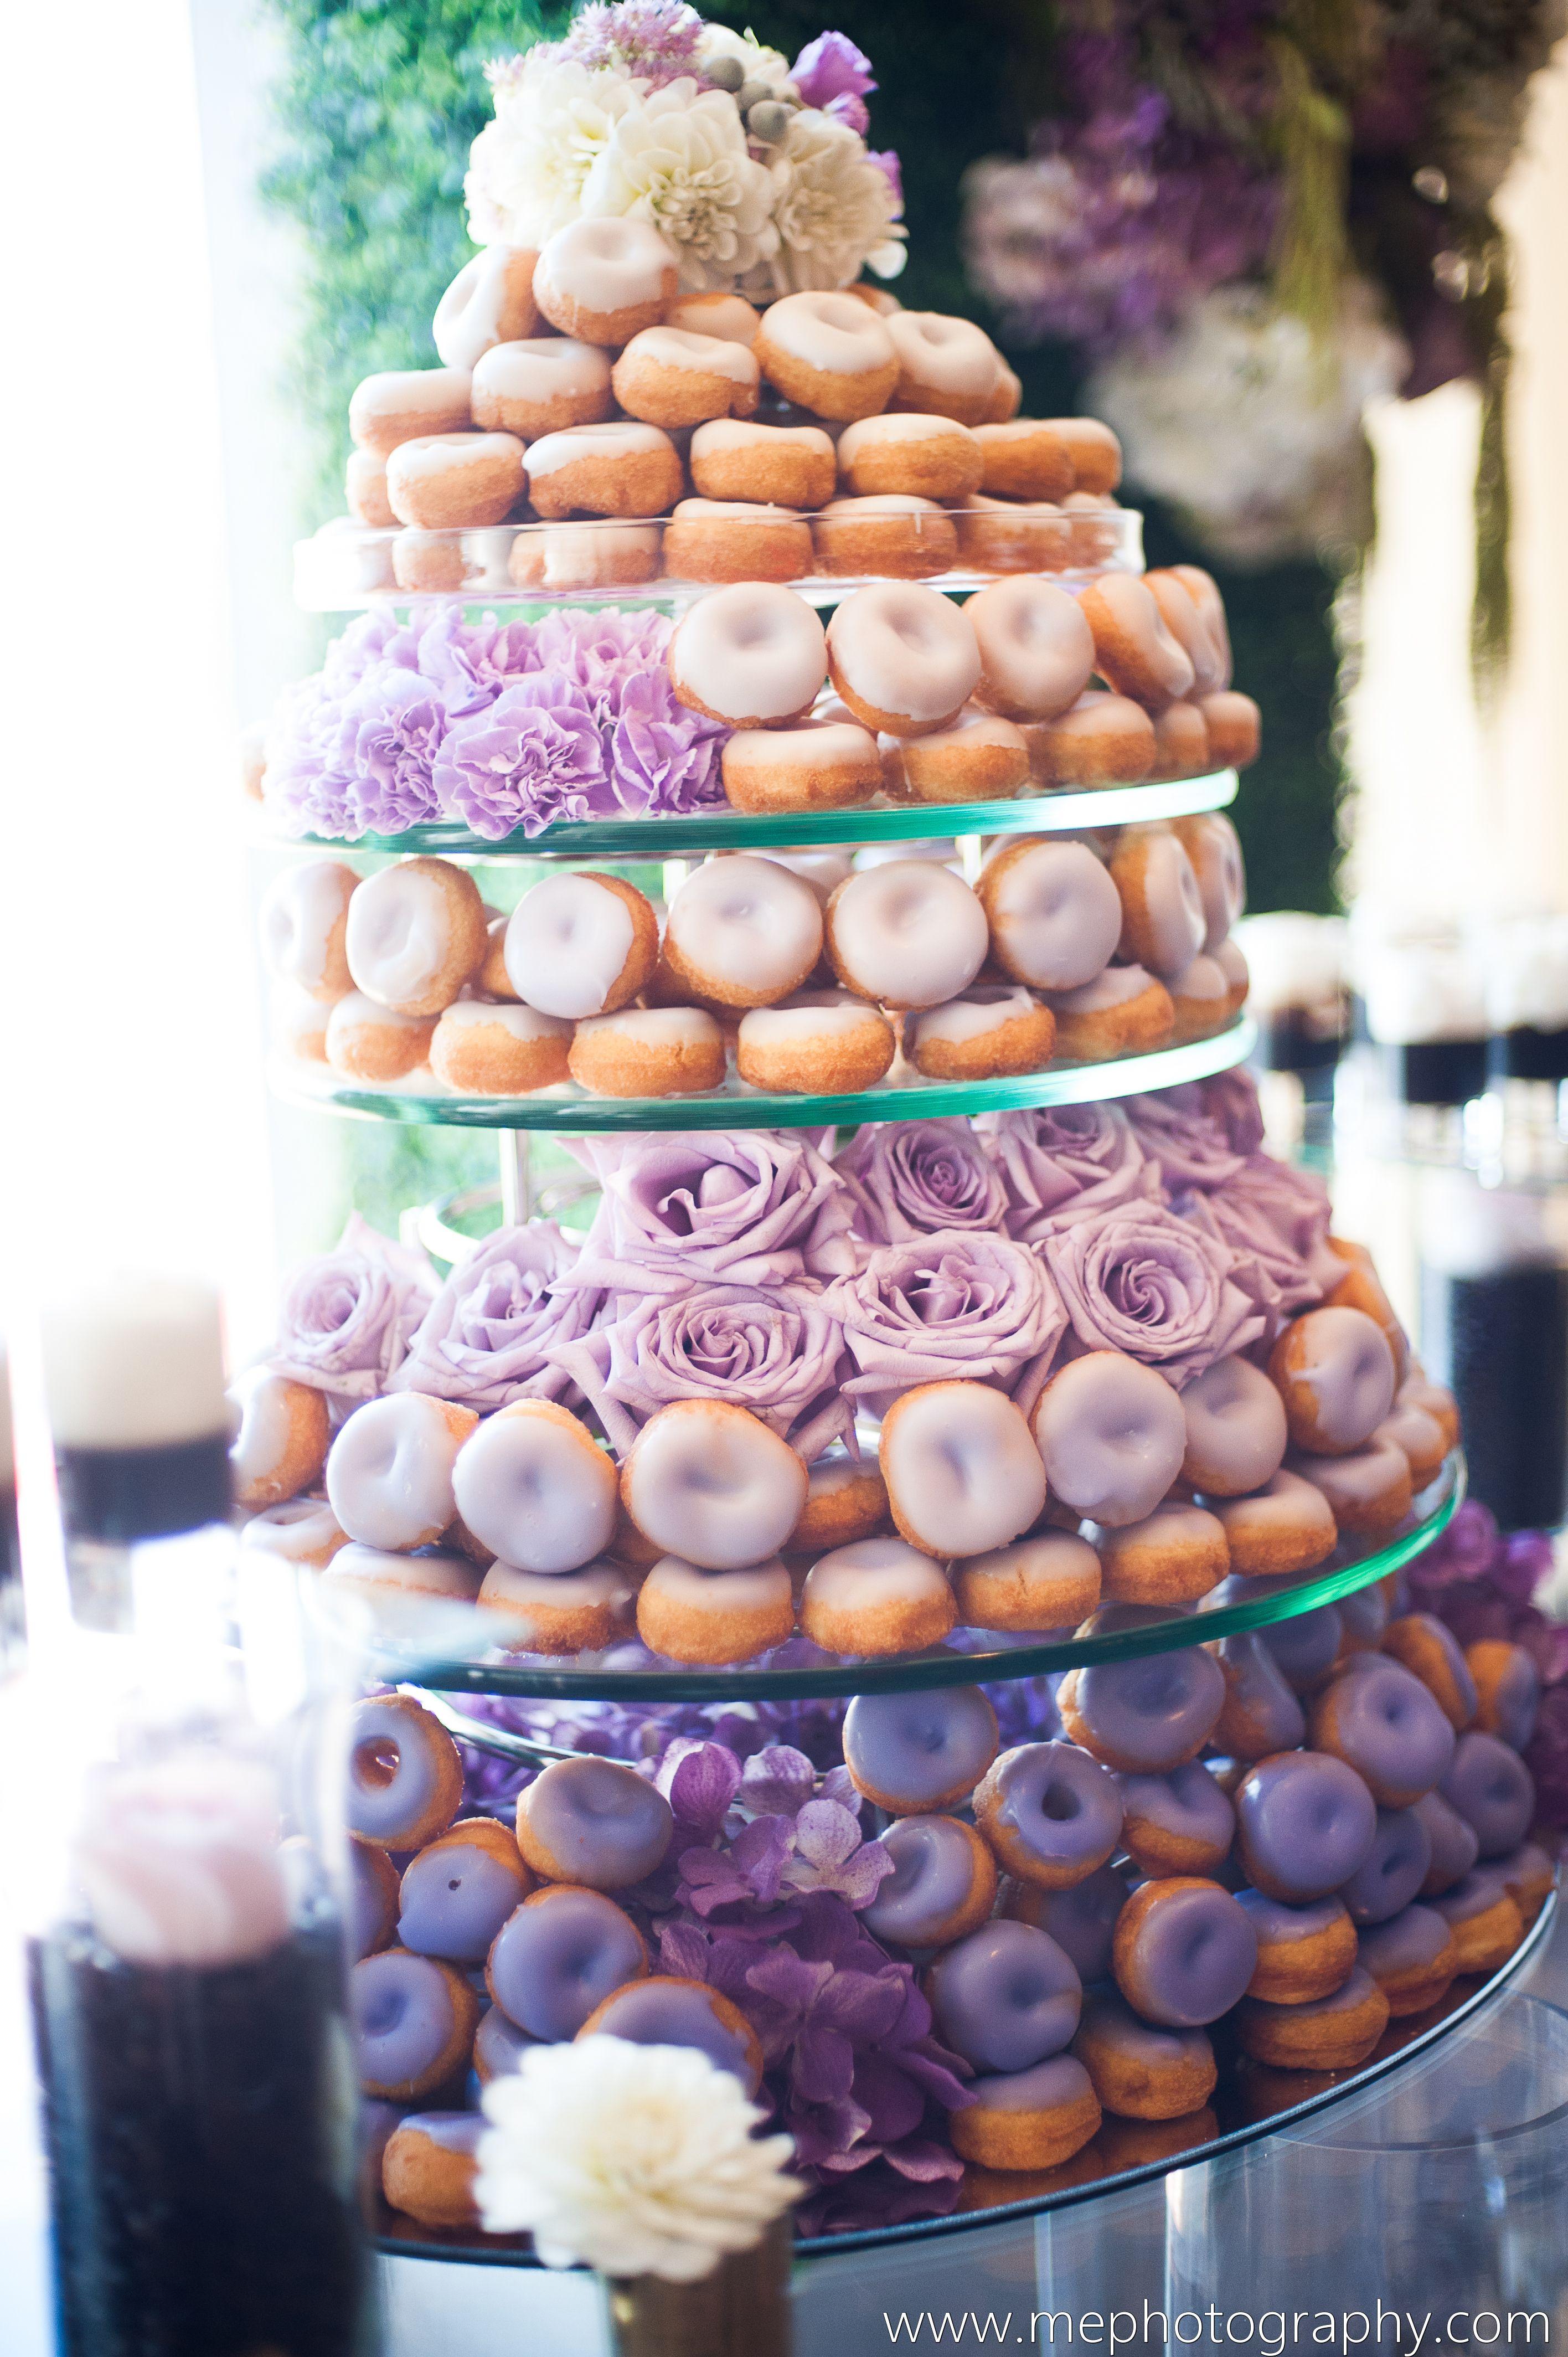 Cakes Desserts Carnation Doughnuts and Dahlia